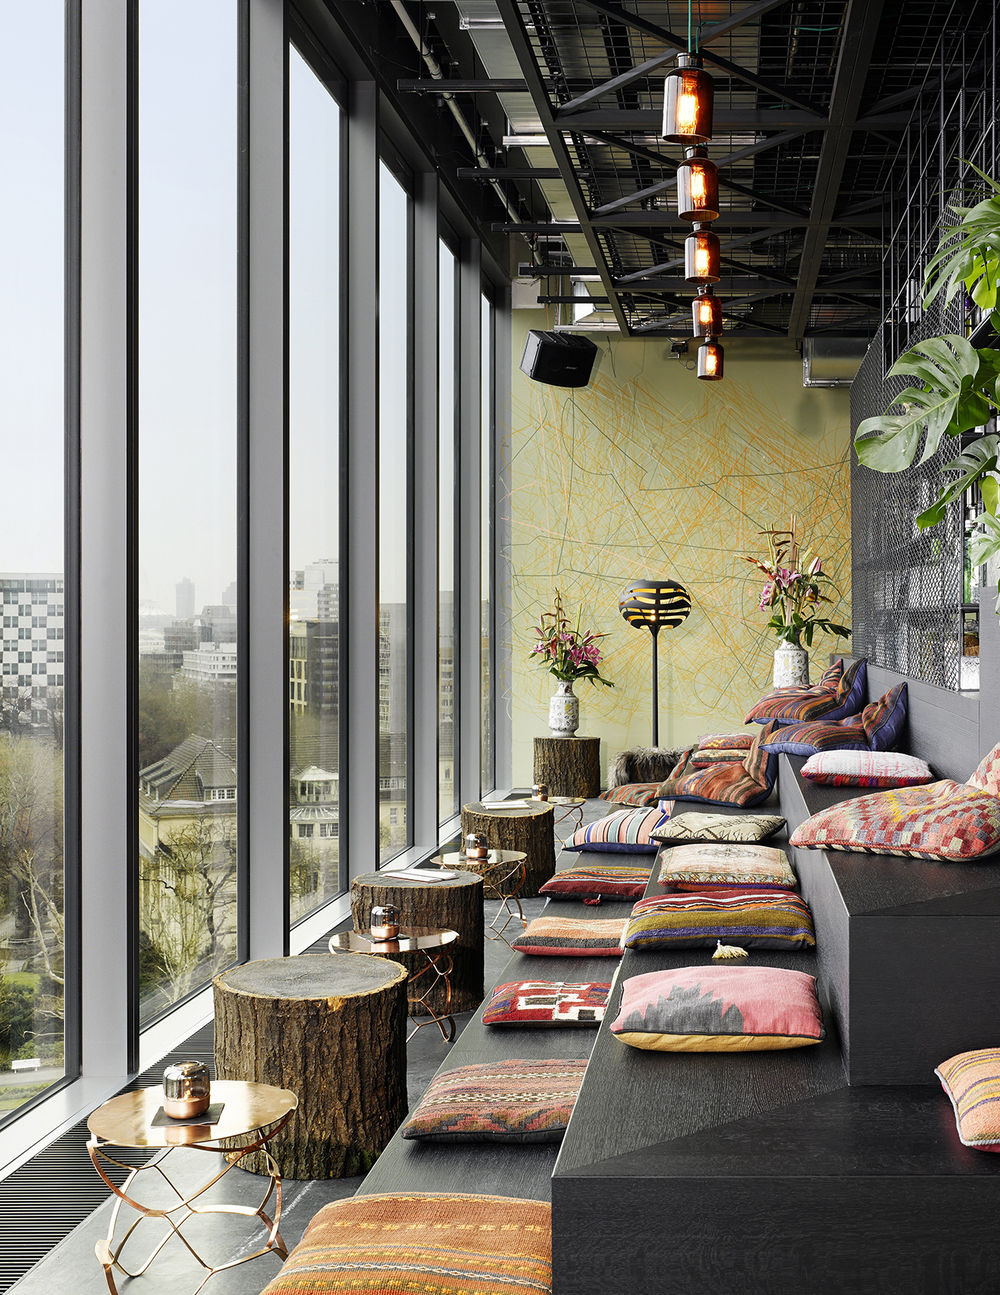 25hours-hotel-berlin-bikini-Studio-Aisslinger-6.jpg